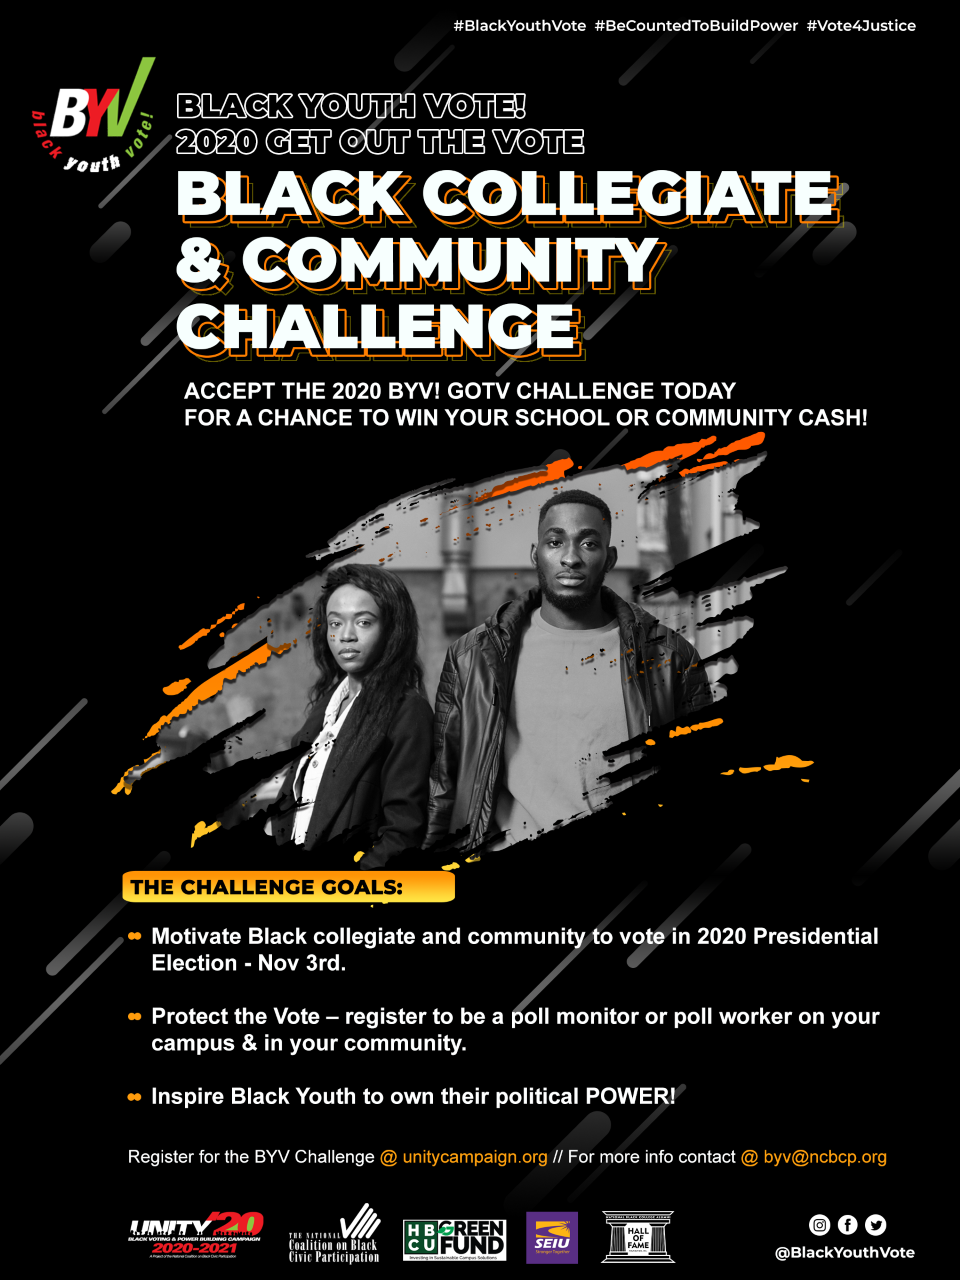 UNITY 20 - BYV_Collegiate_&_Community_Challenge